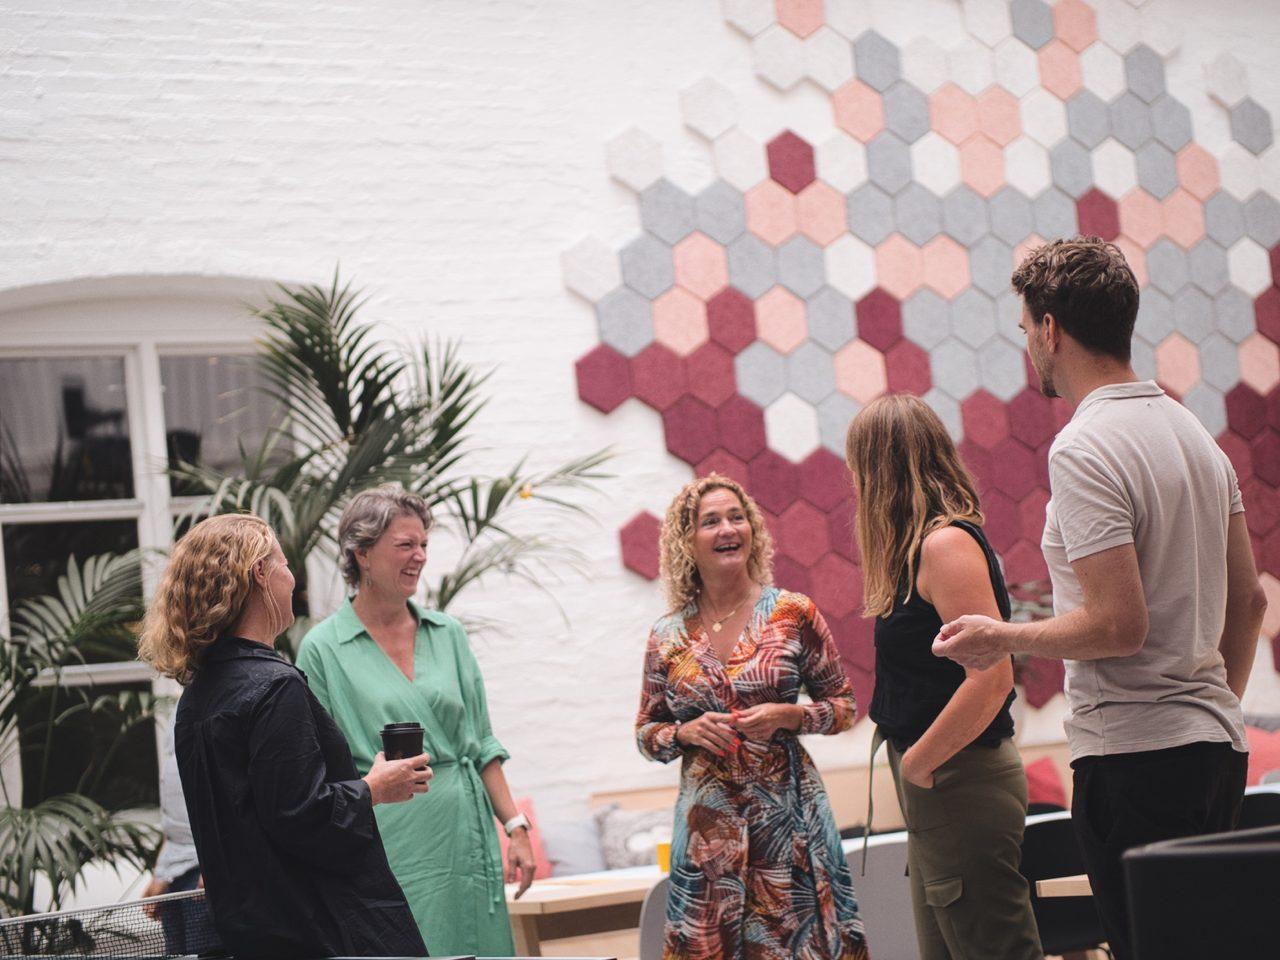 Interior design, Social group, Microphone, Plant, Human, Fashion, Fun, Interaction, Entertainment, Community